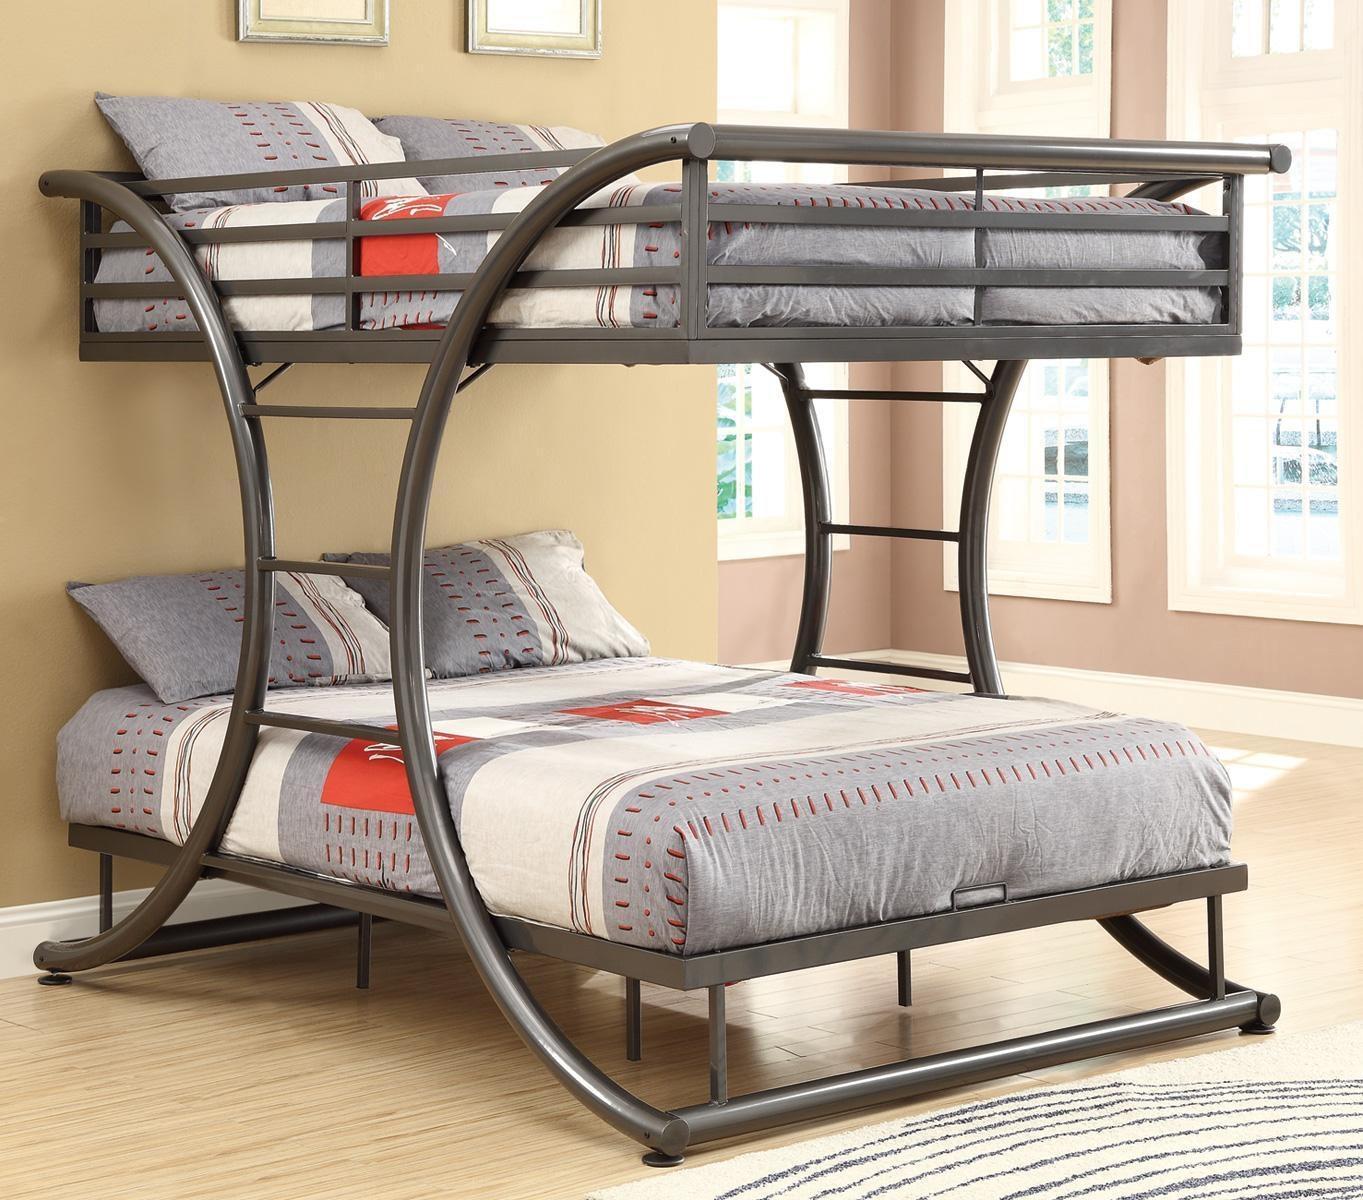 Bunk Beds : Kmart Bunk Beds With Mattress Best Bed Frame Under 200 Throughout Kmart Bunk Bed Mattress (Image 7 of 20)